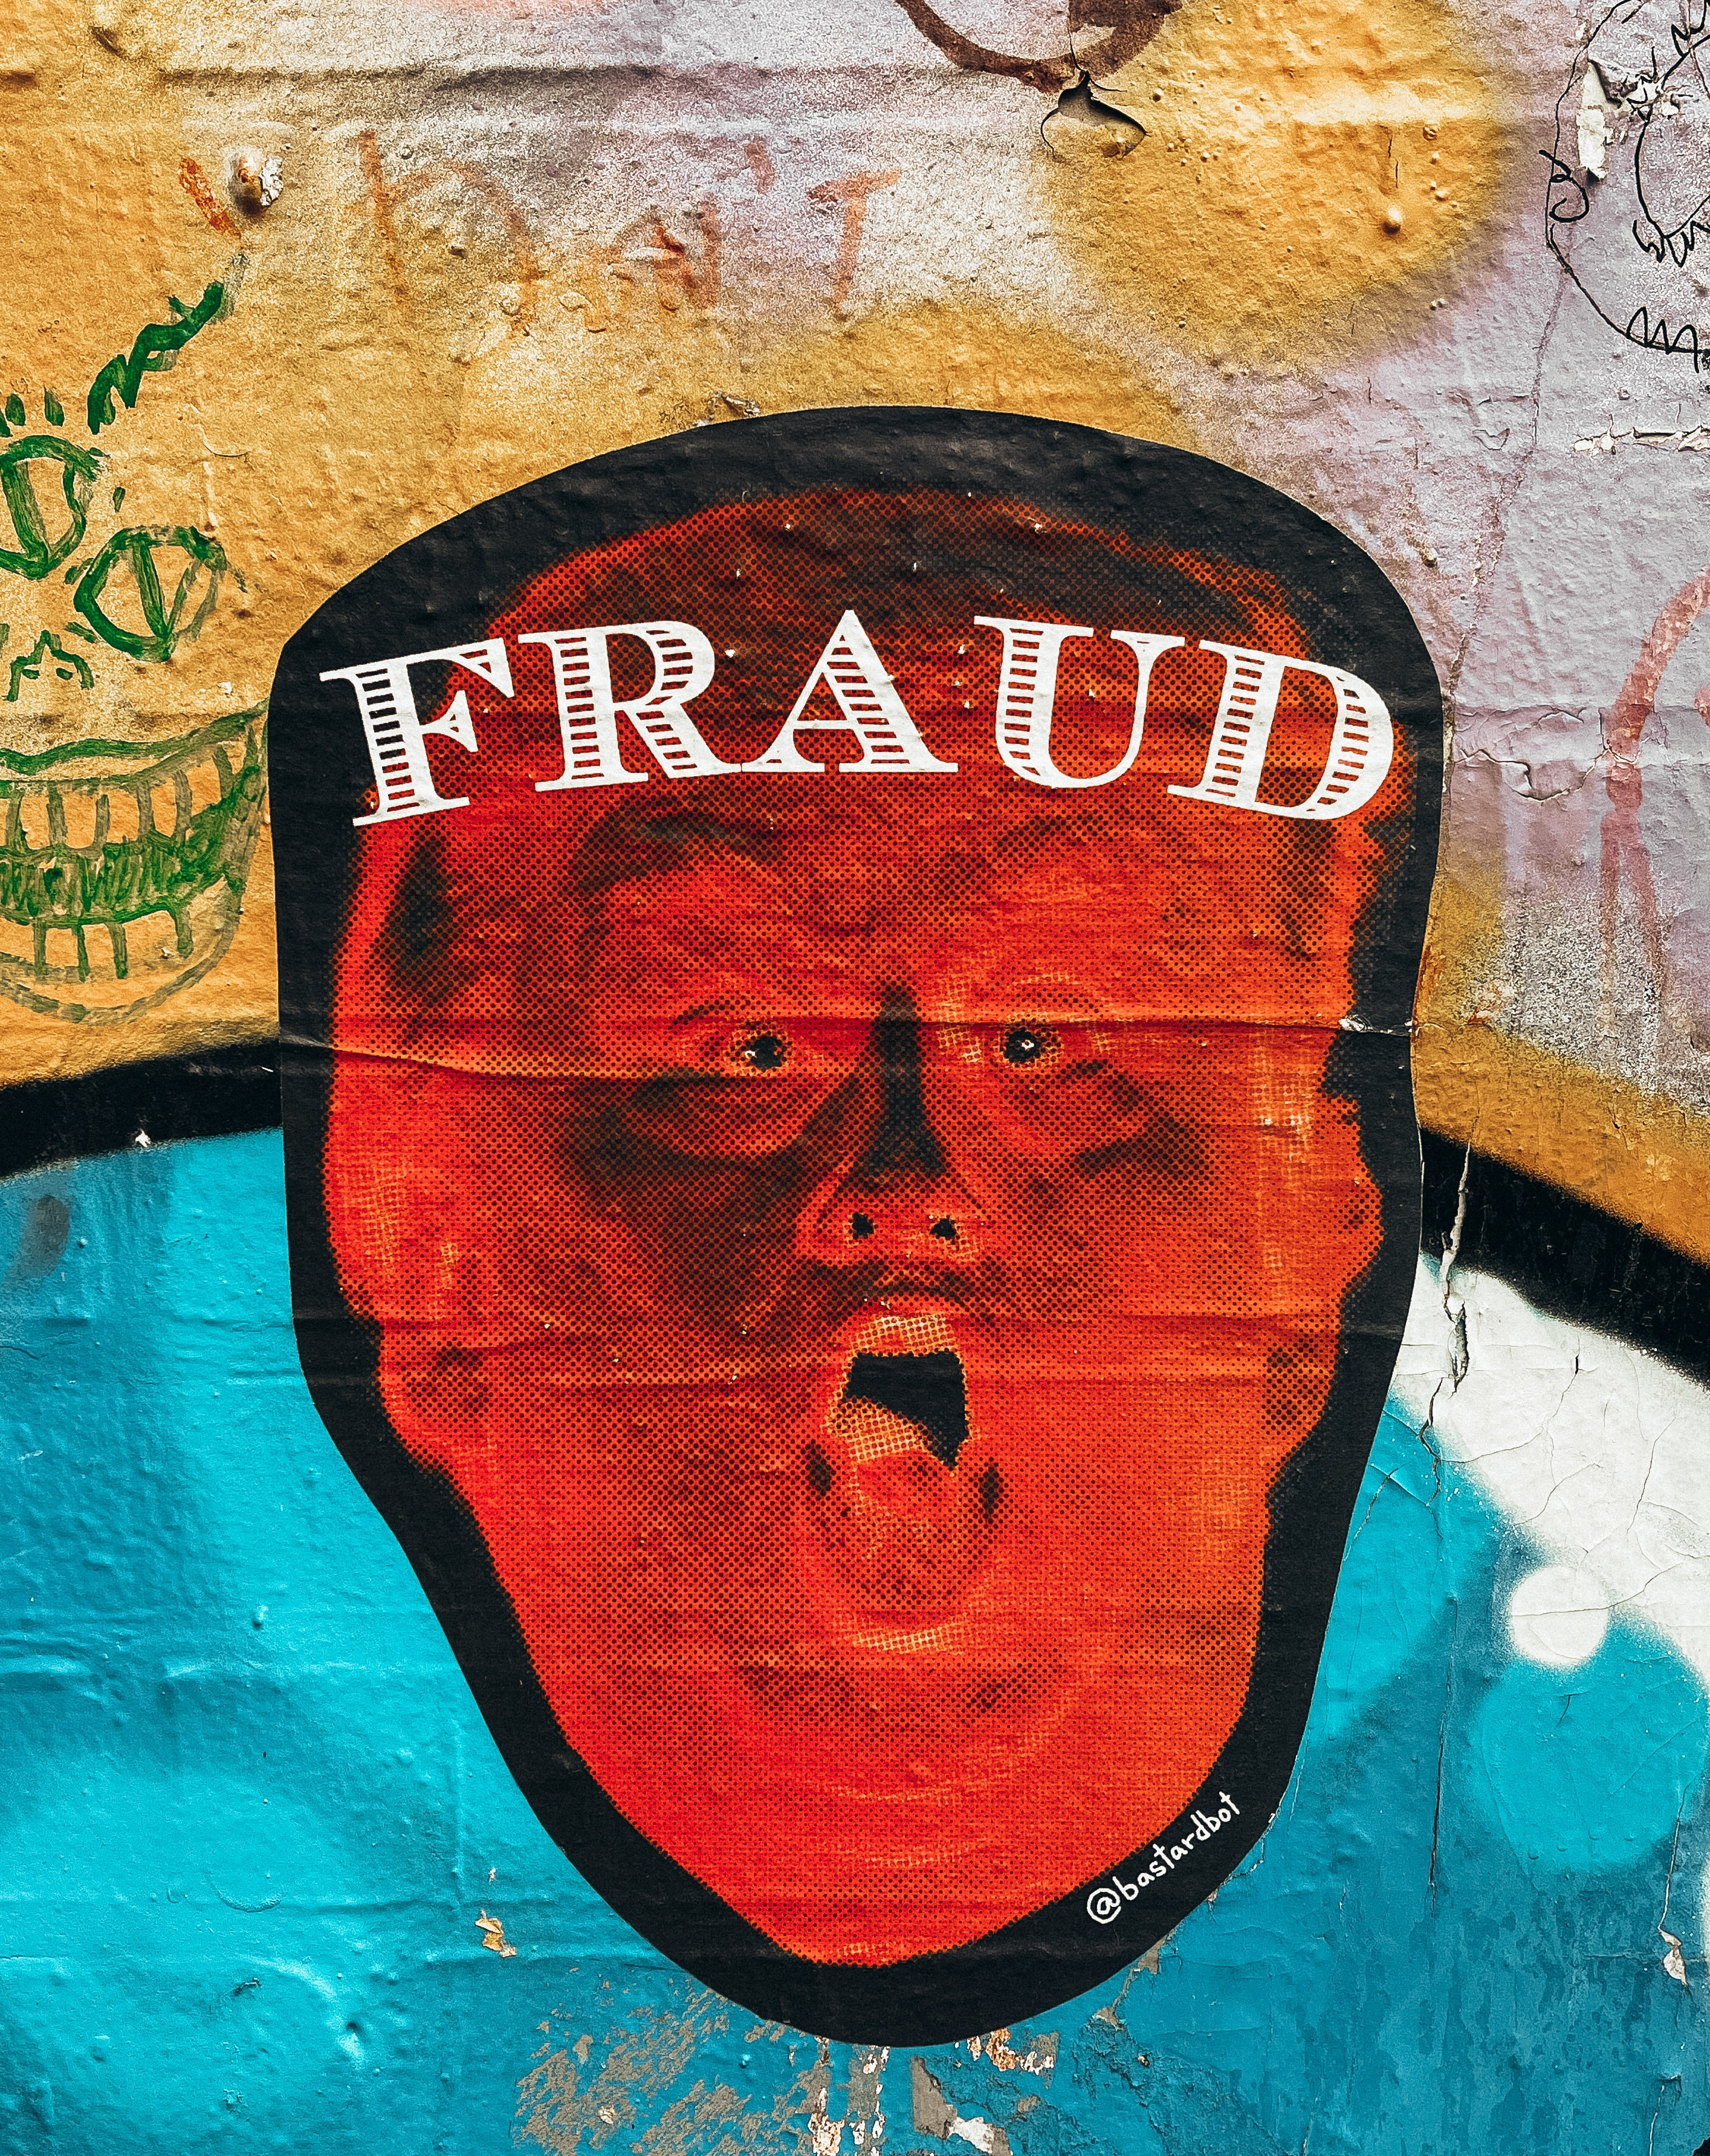 Men Charged in Fraudulent Loan Scheme